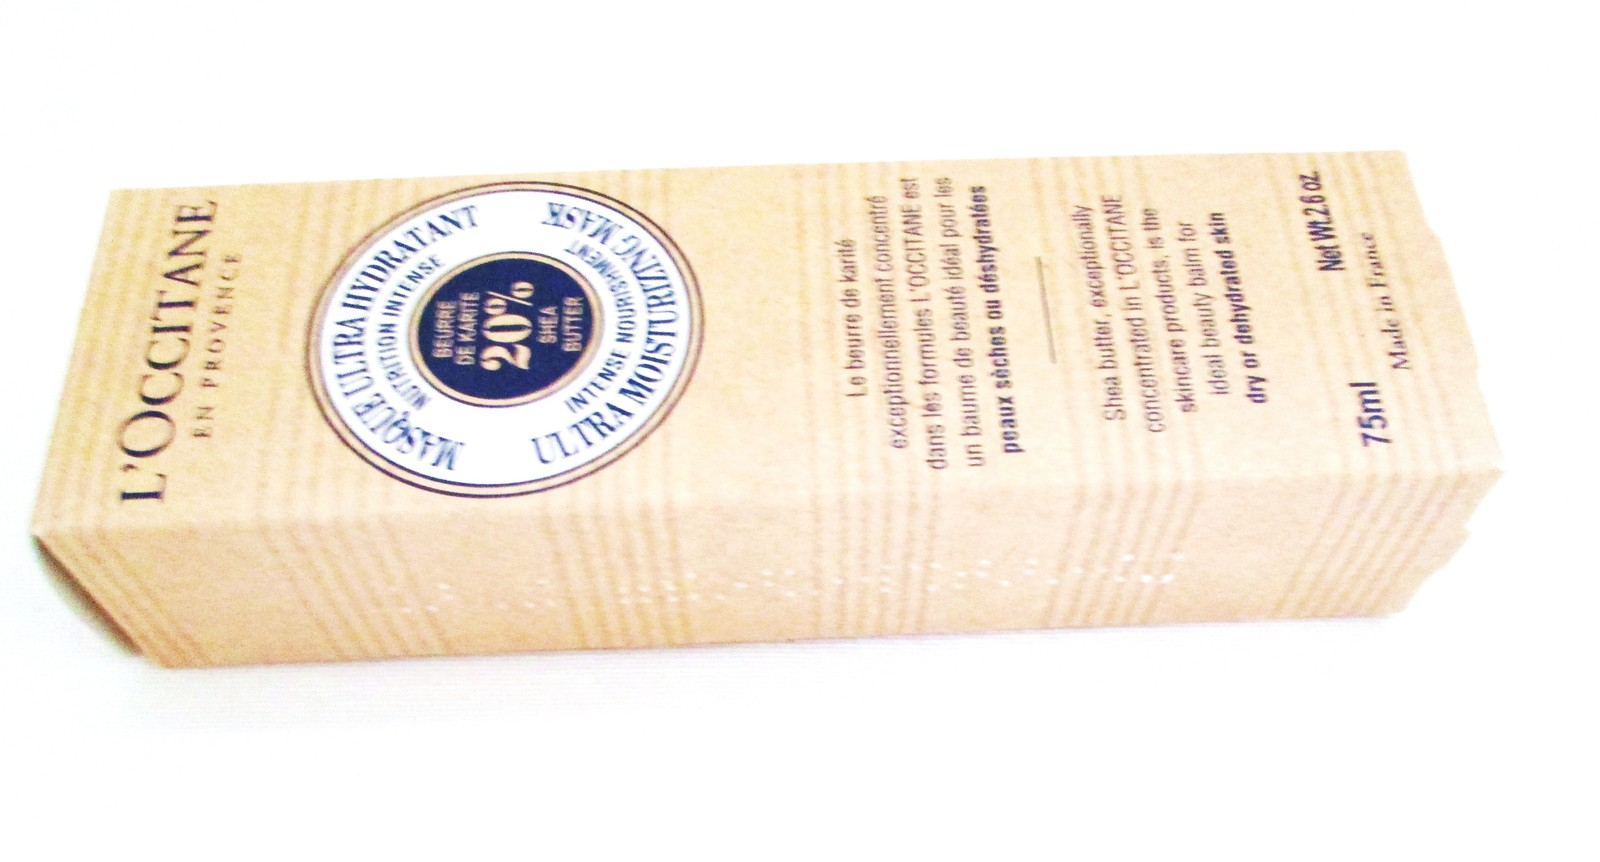 L'Occitane Ultra Moisturizing Mask 20% Shea. Boxed image 5